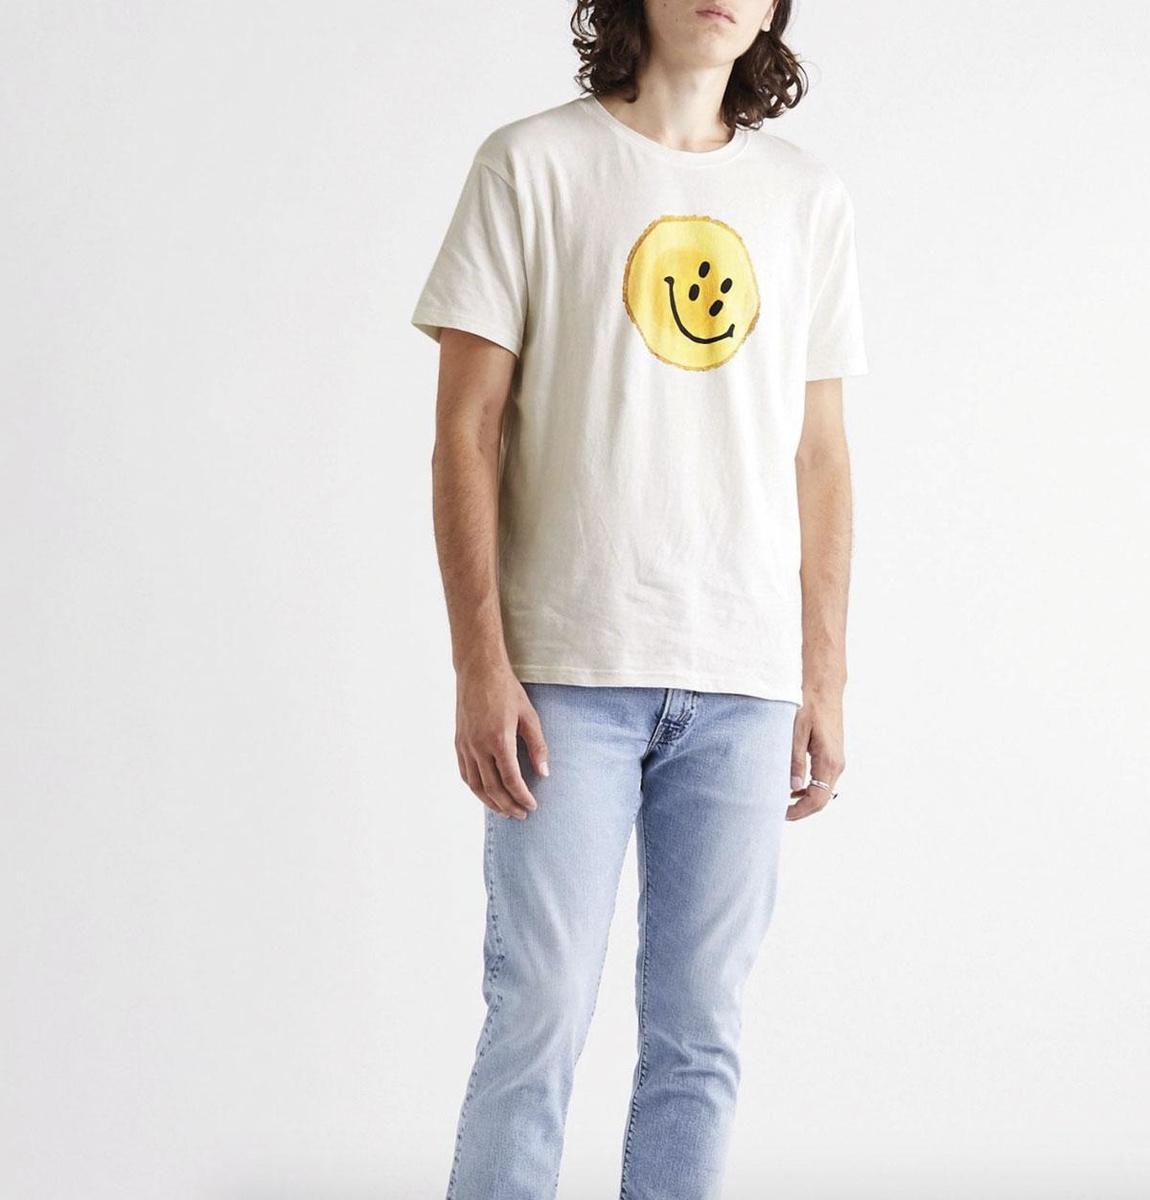 Tee-shirt en coton, Kapital, 120 euros, mrporter.com, sdp/ kapital